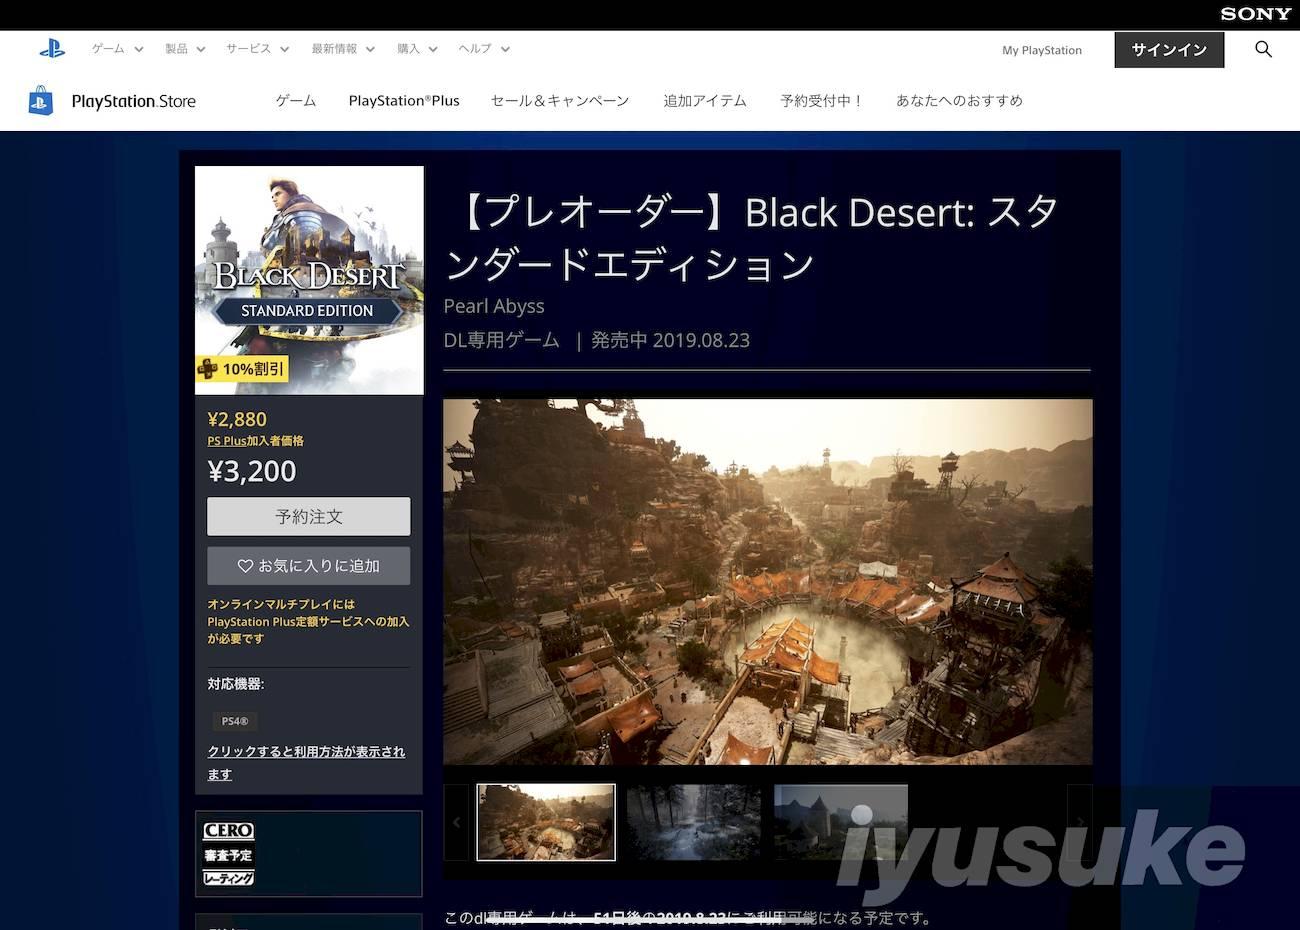 PS4版 黒い砂漠 スタンダードエディション